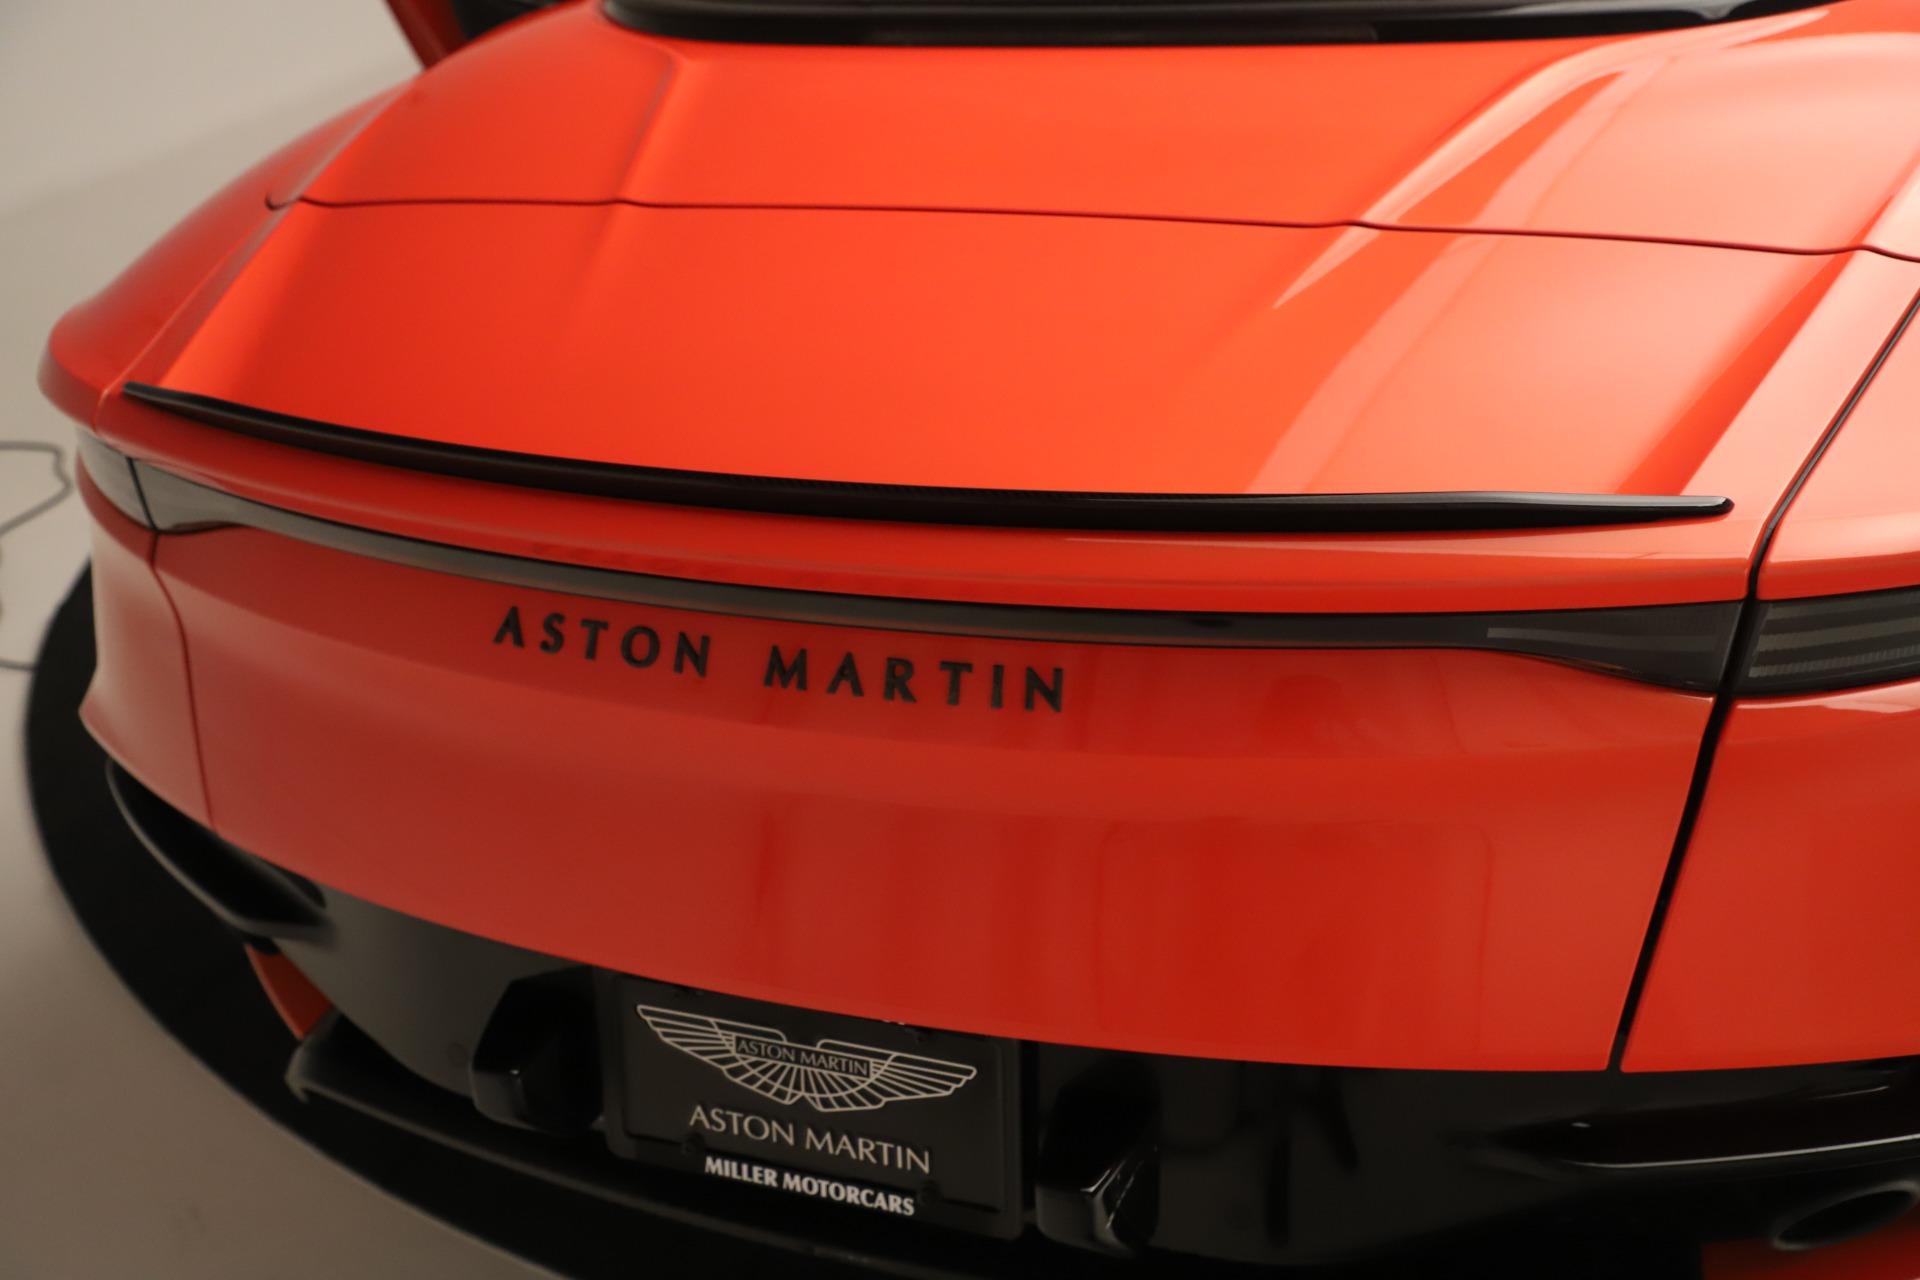 New 2020 Aston Martin DBS Superleggera For Sale In Westport, CT 3401_p52